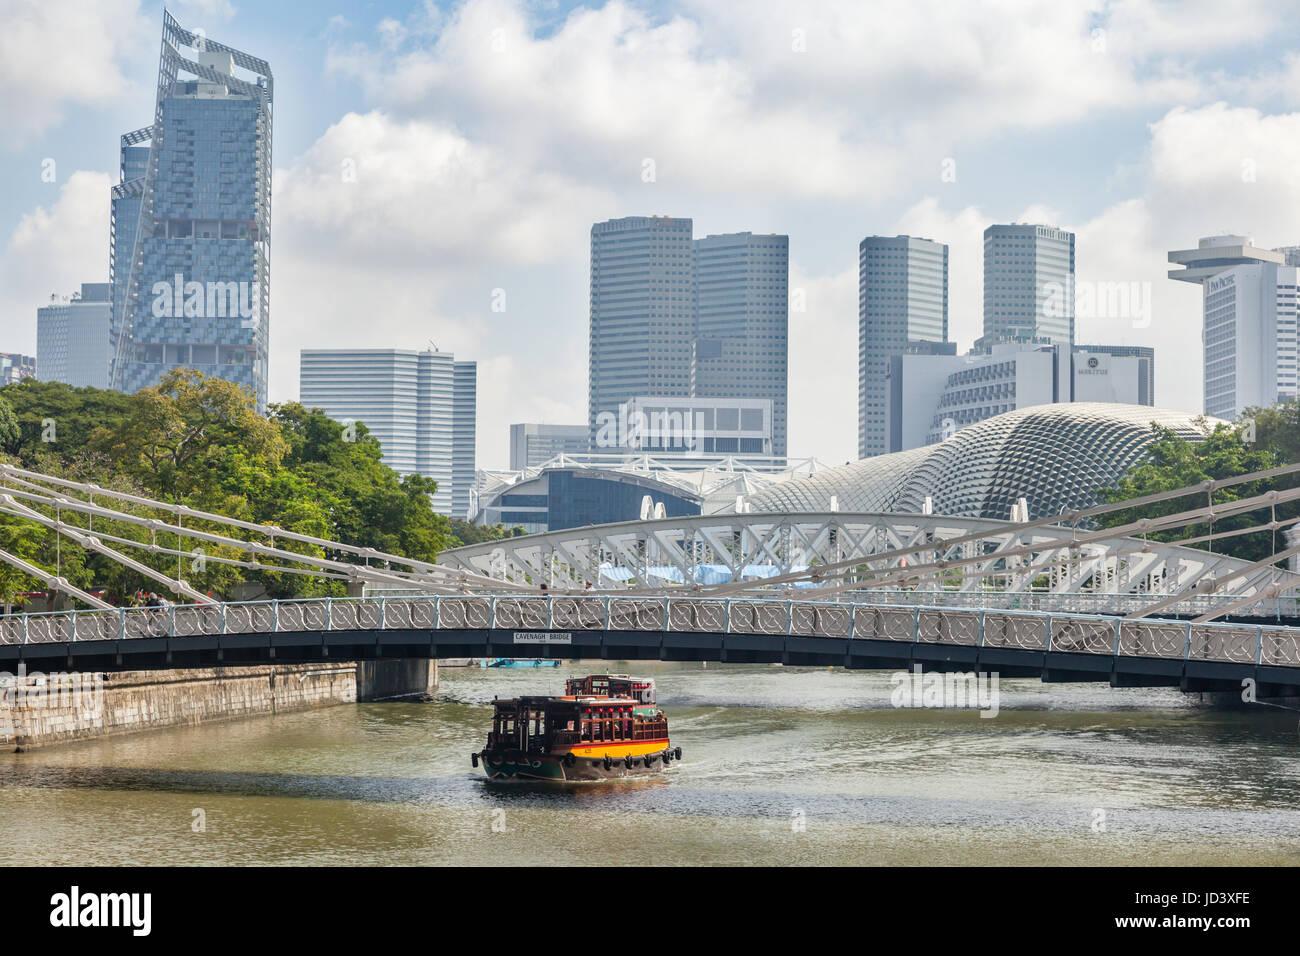 A cruise boat under Cavenagh bridge, Singapore - Stock Image